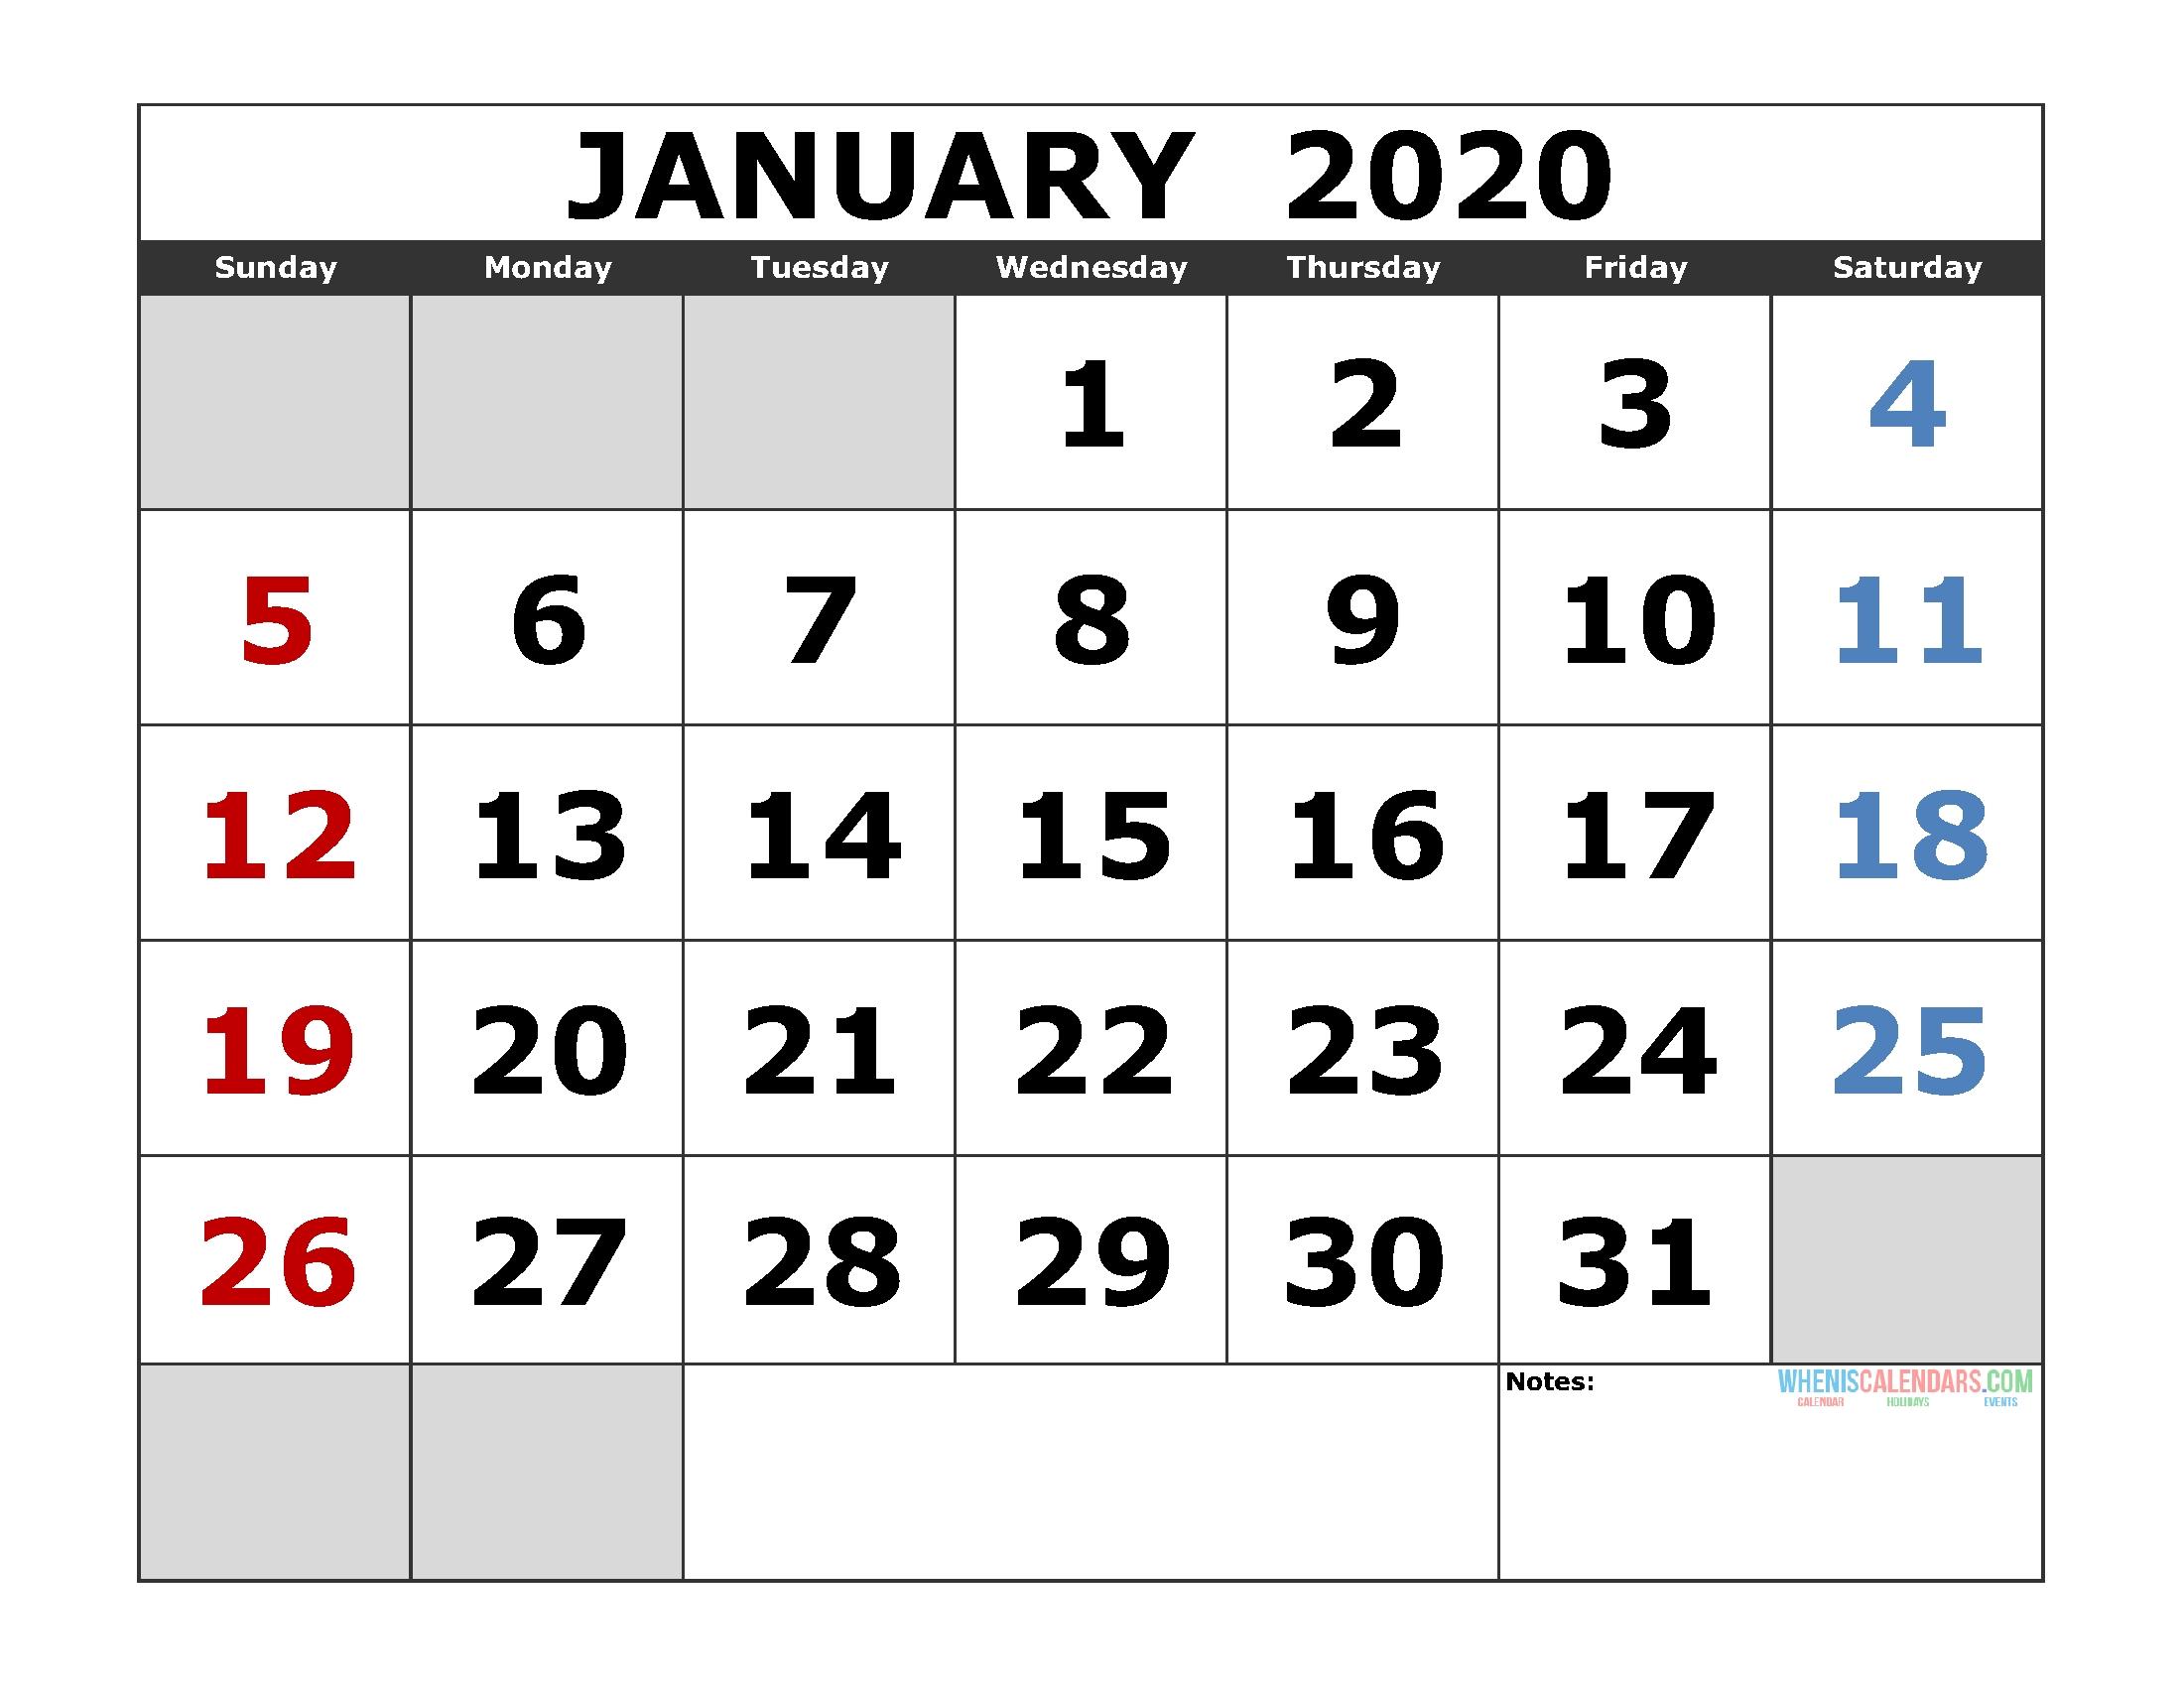 January 2020 Printable Calendar Template Excel, Pdf, Image-January 2020 Jewish Calendar